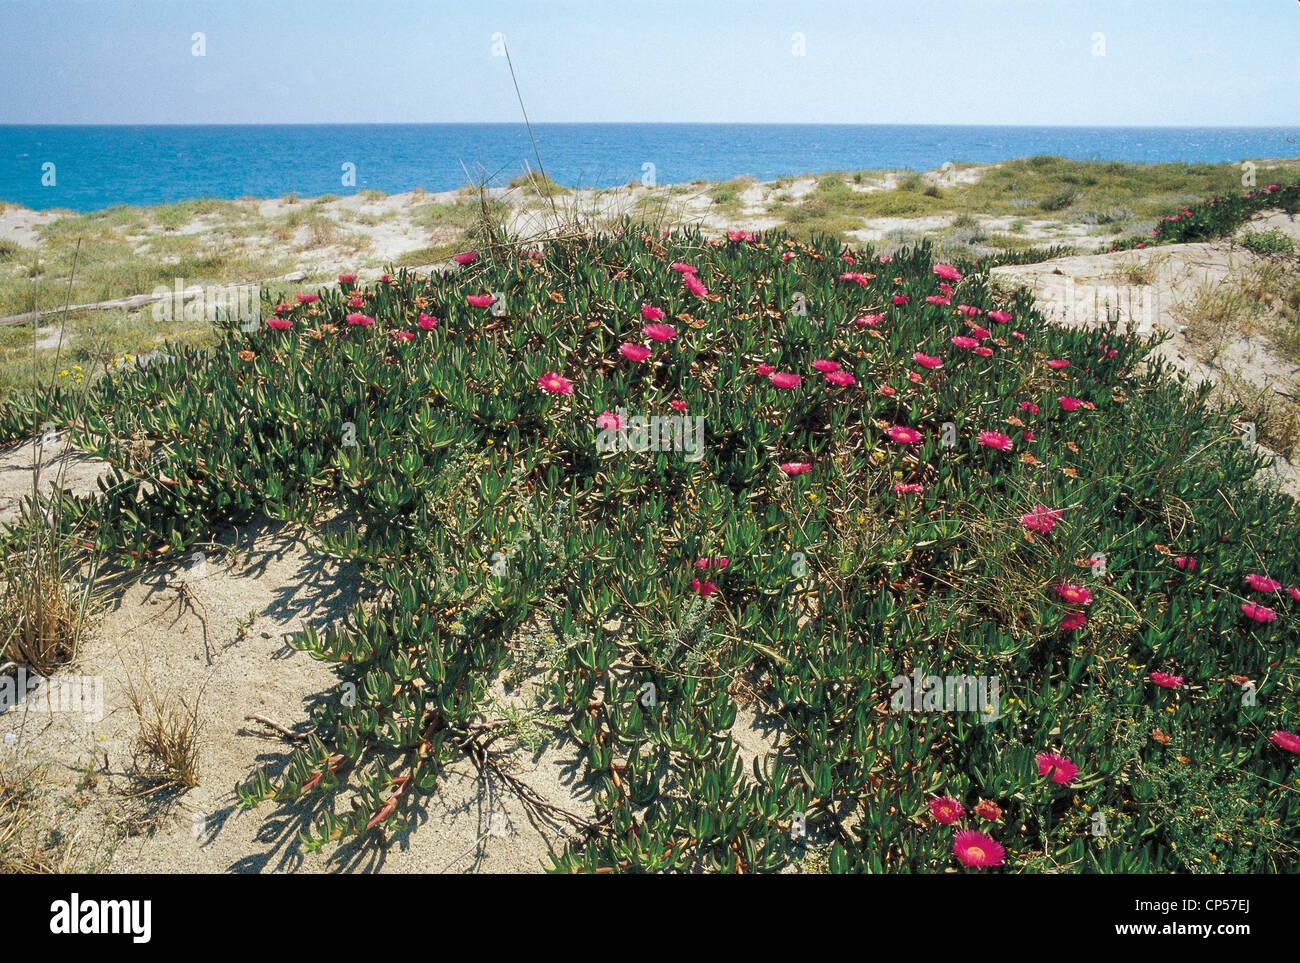 CALABRIA SIDERNO Ionian Coast - Stock Image